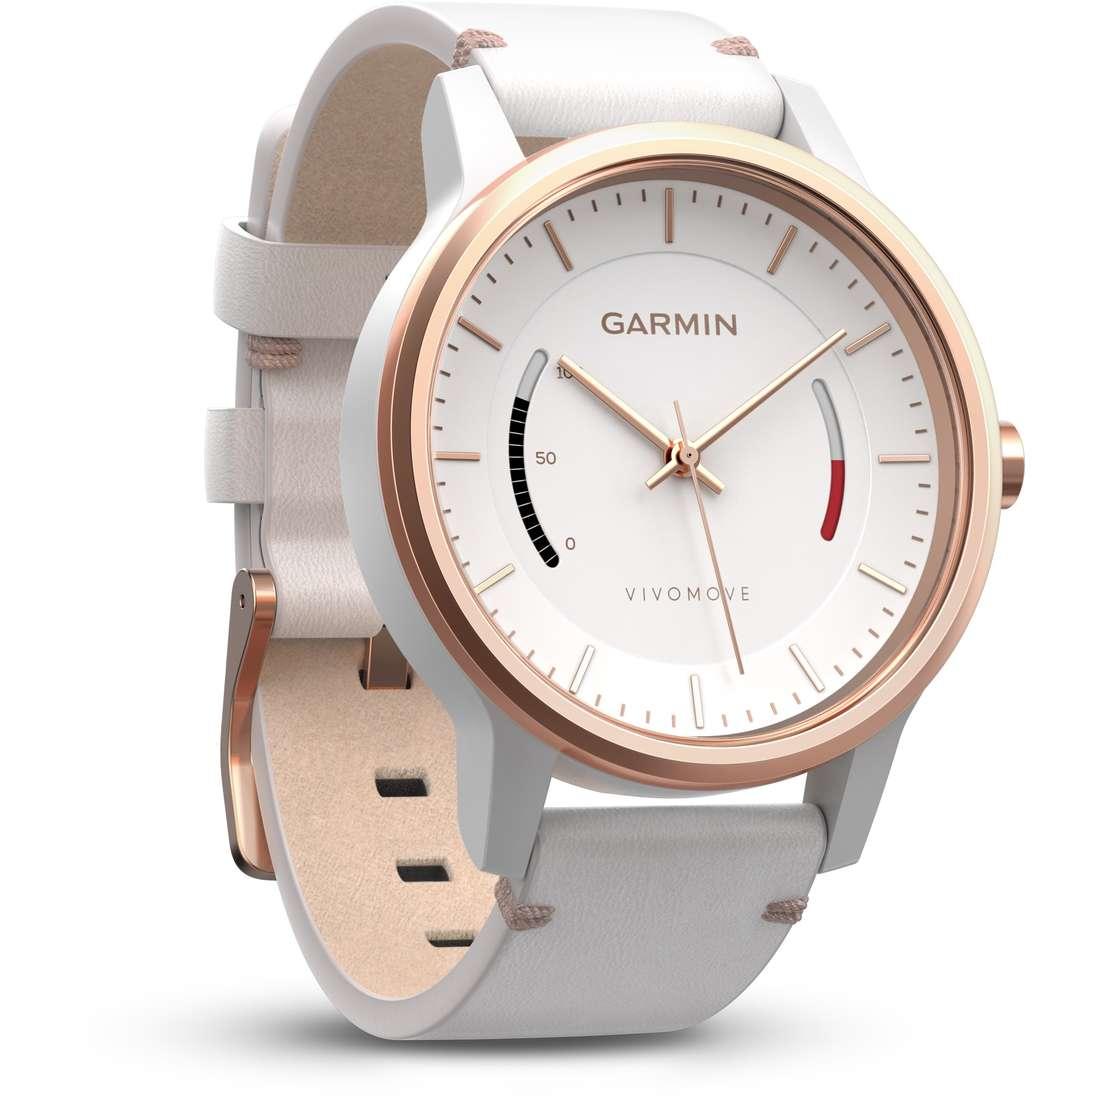 montre Smartwatch unisex Garmin Vivomove 010-01597-11